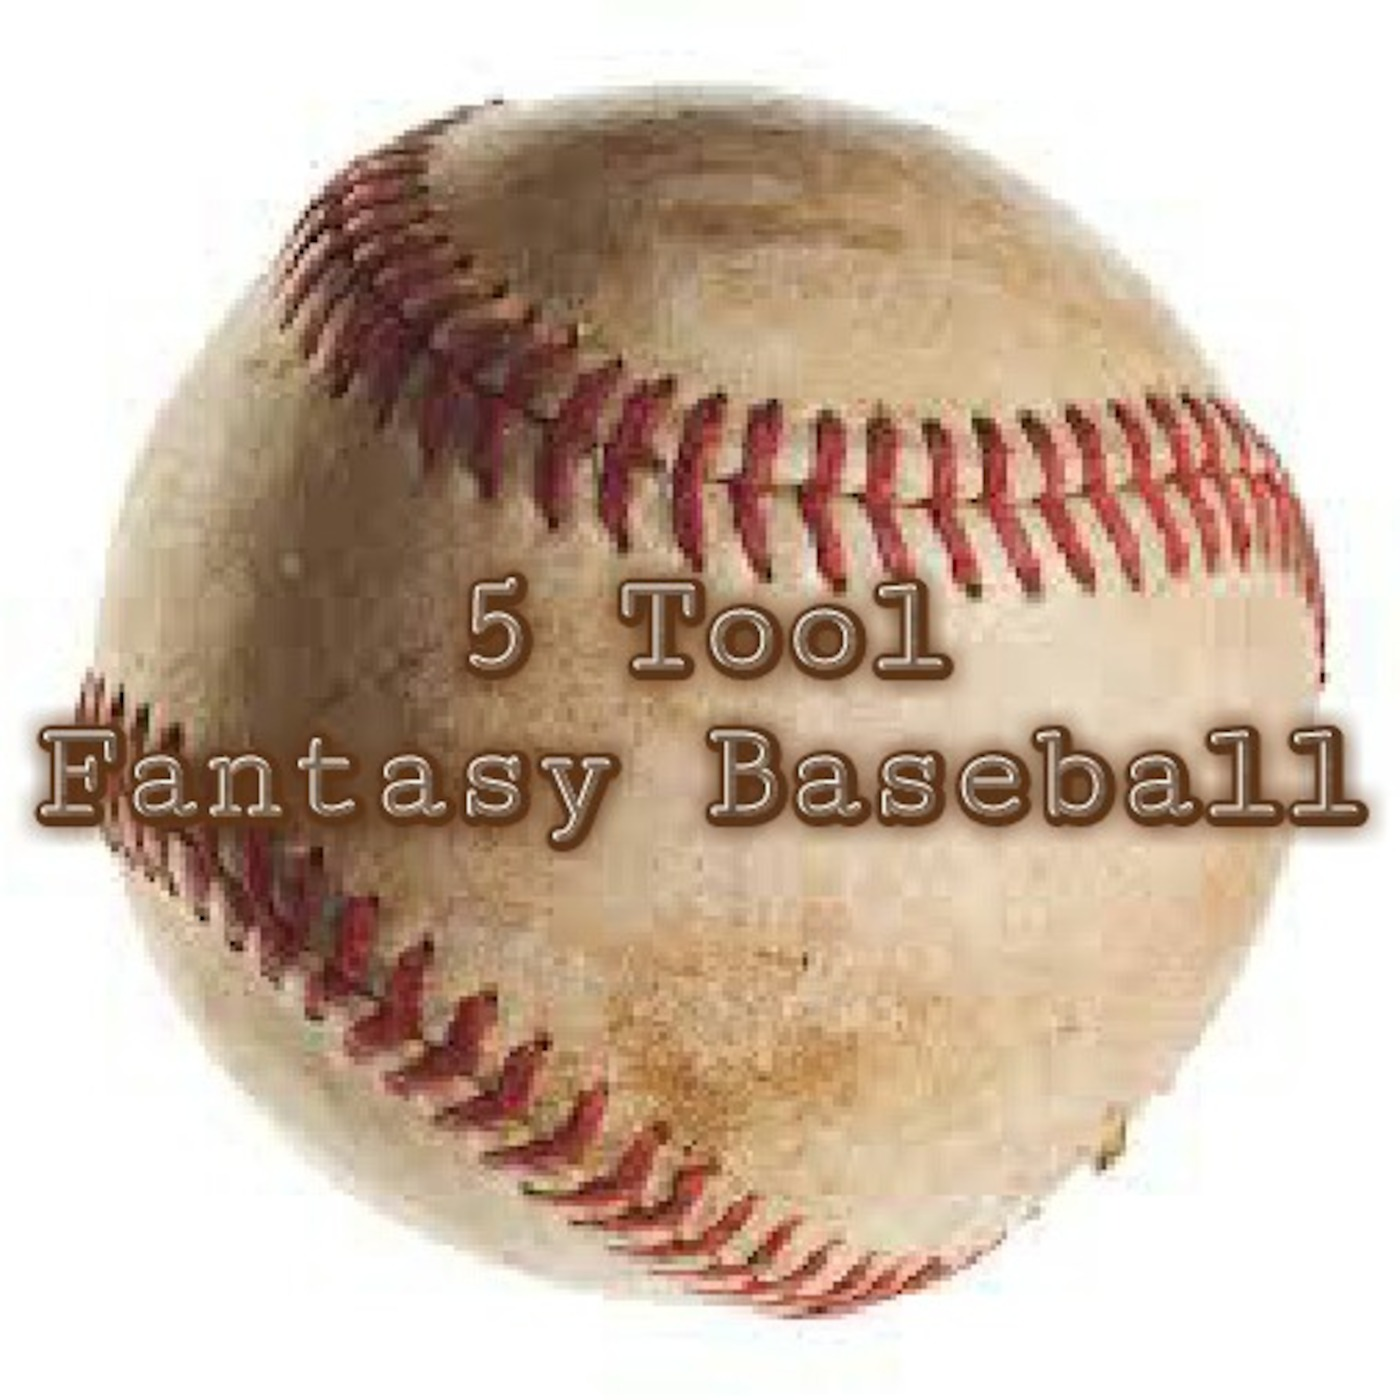 5 Tool Fantasy Baseball